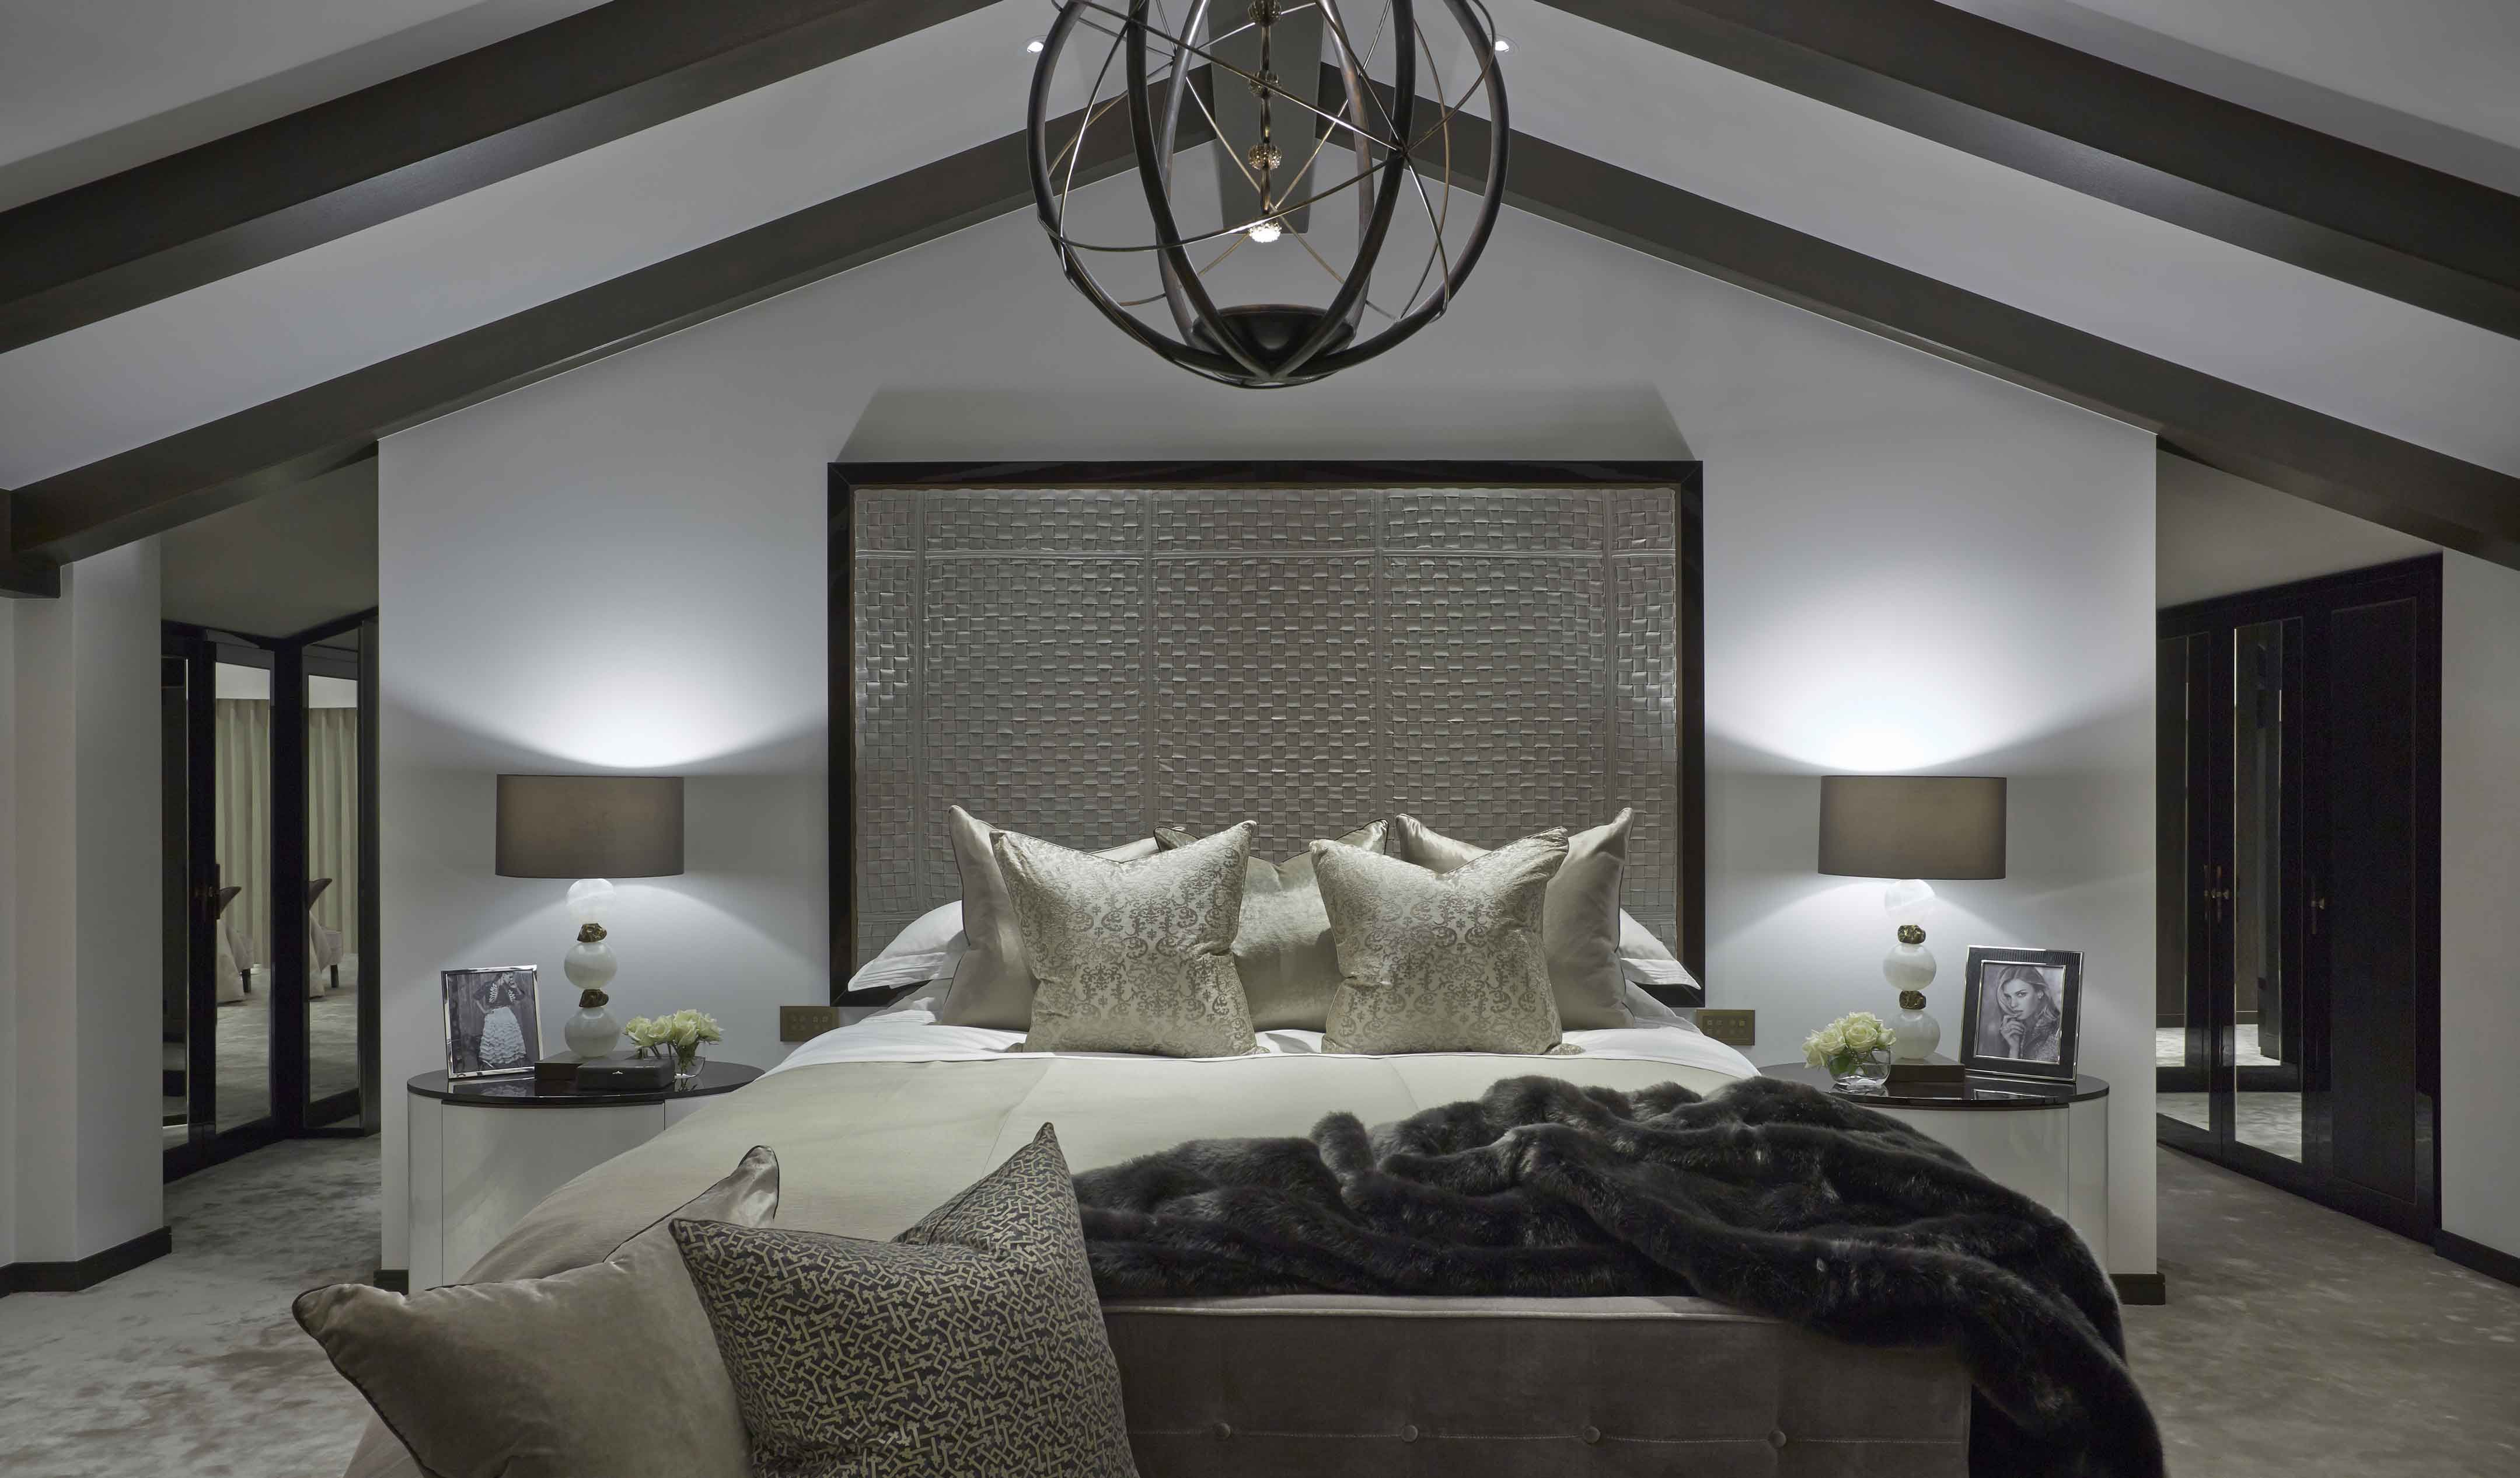 Family Chalet Switzerland   Bedroom @lbdesignstudio Classic Decor, Luxury  Interior, Best Interior Designer